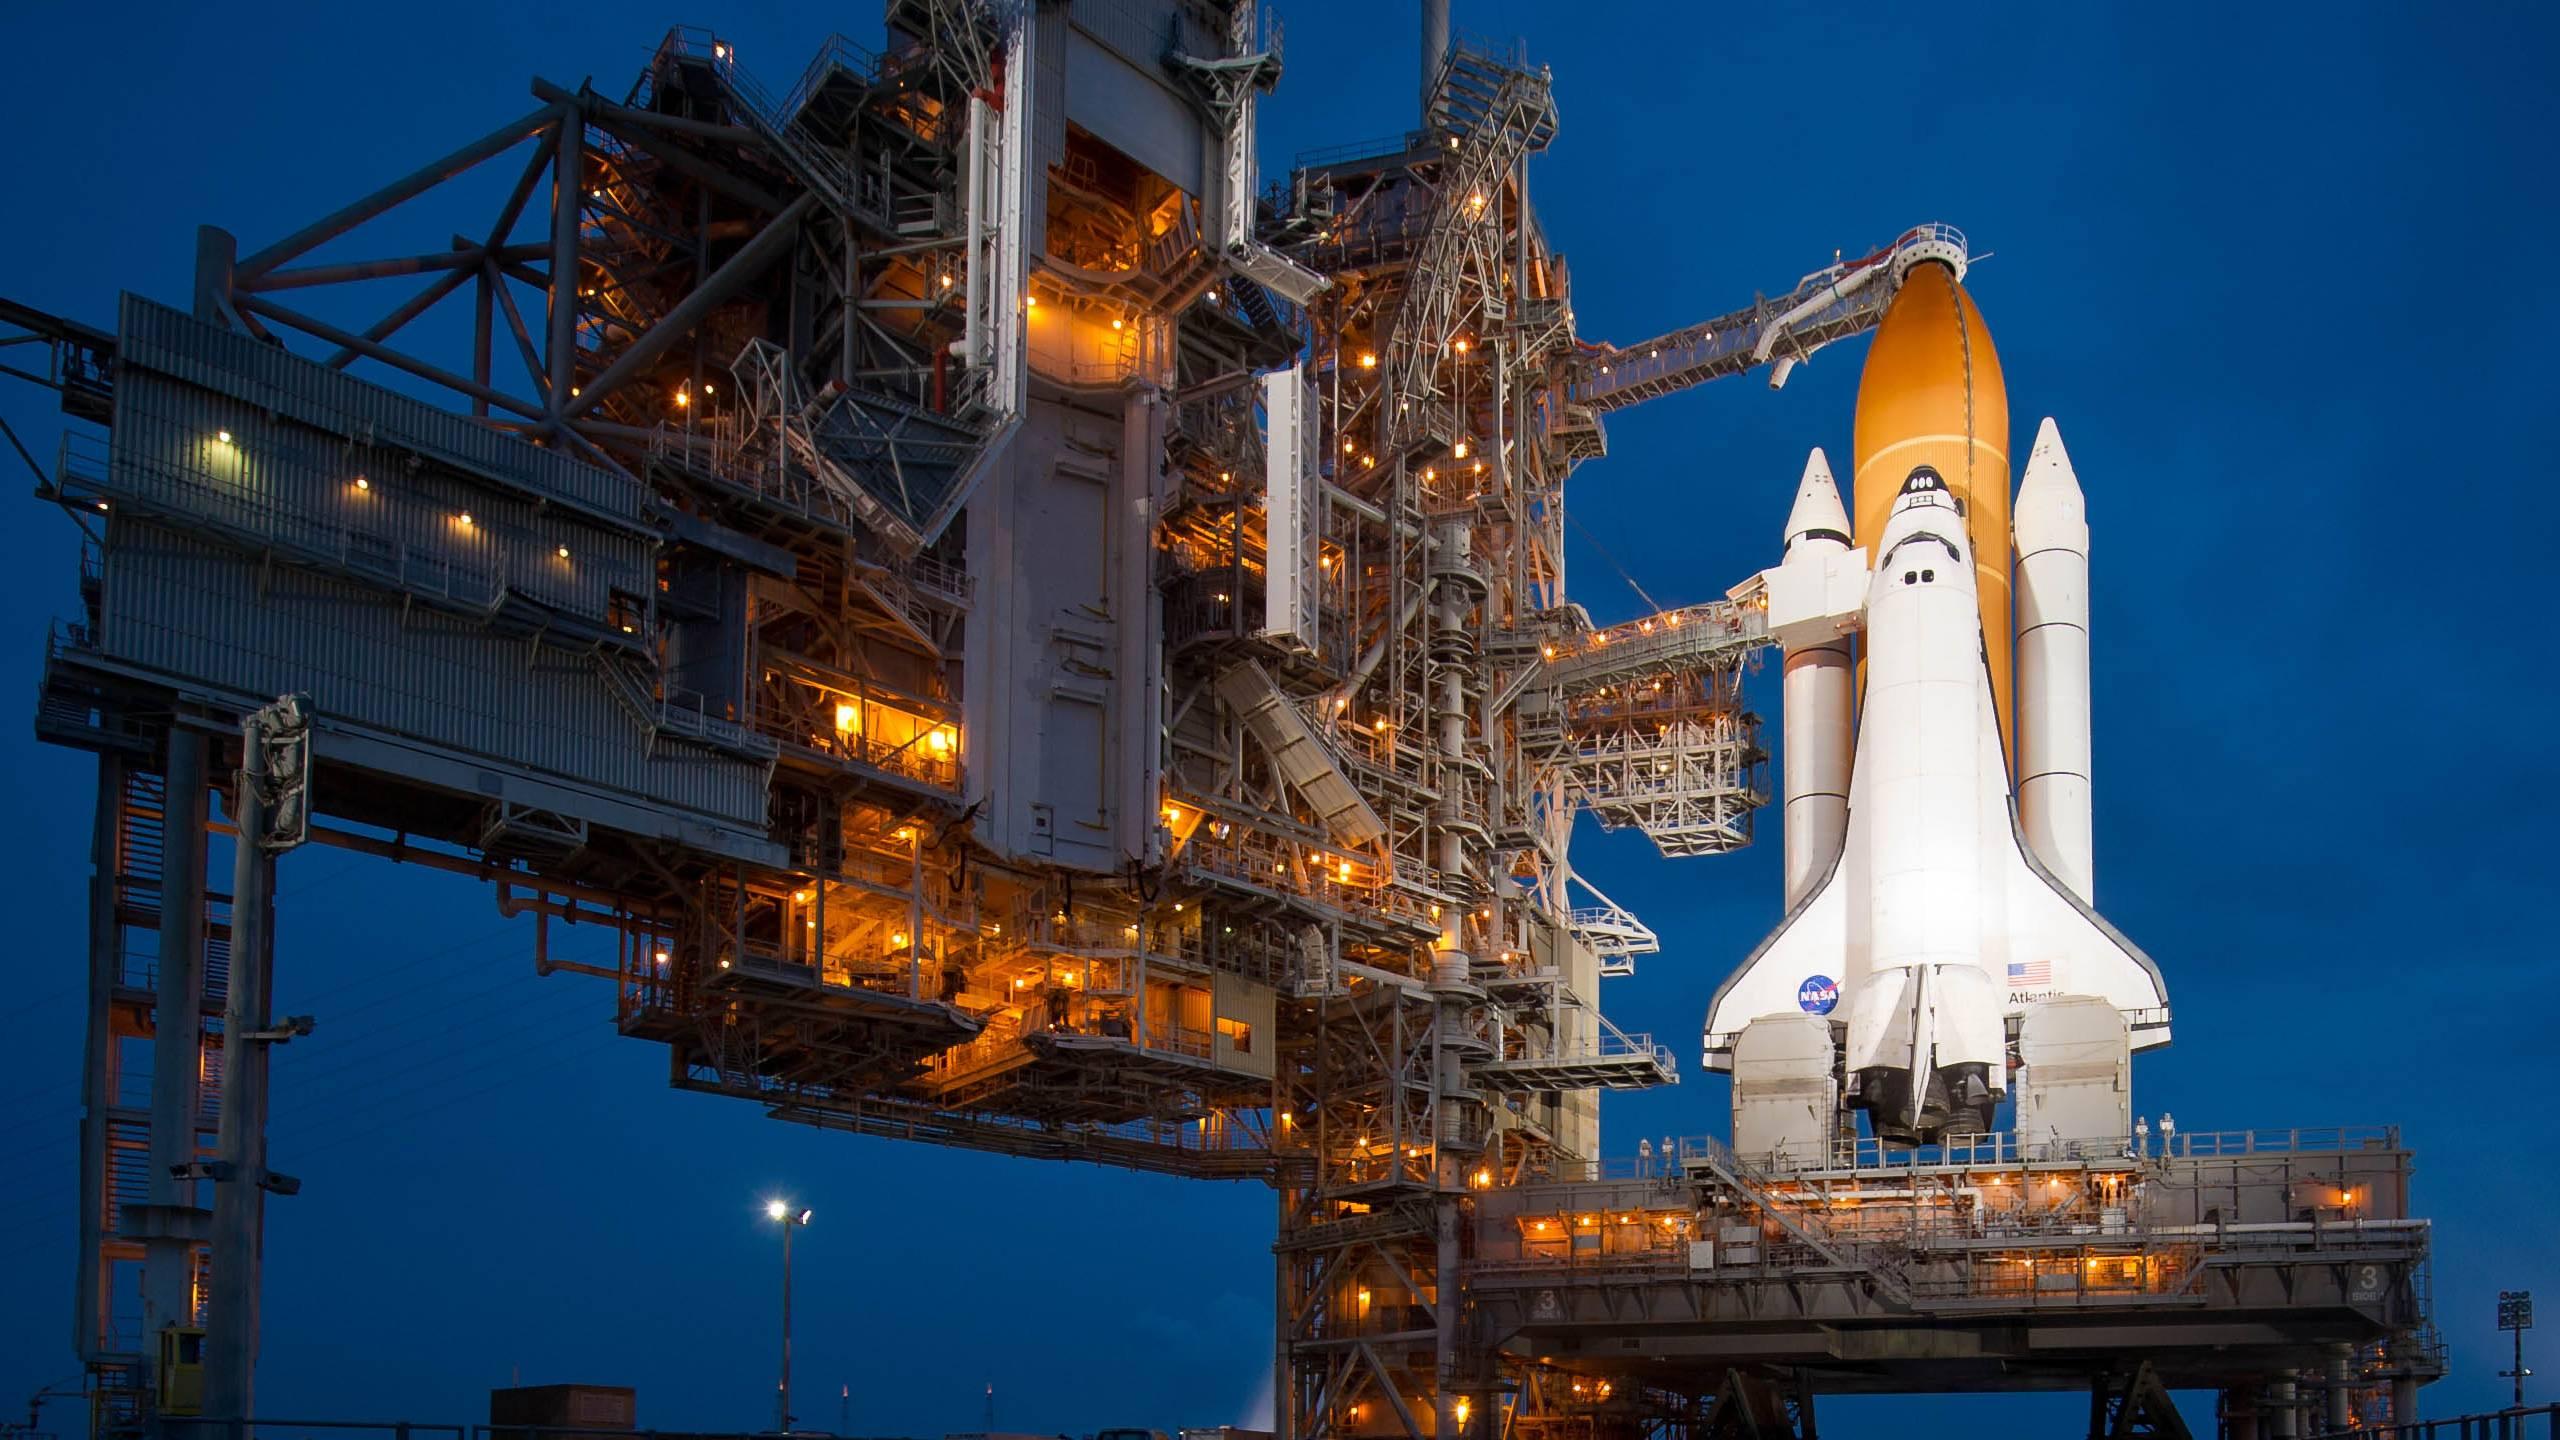 NASA Space Shuttle Wallpaper on MarkInternationalinfo 2560x1440